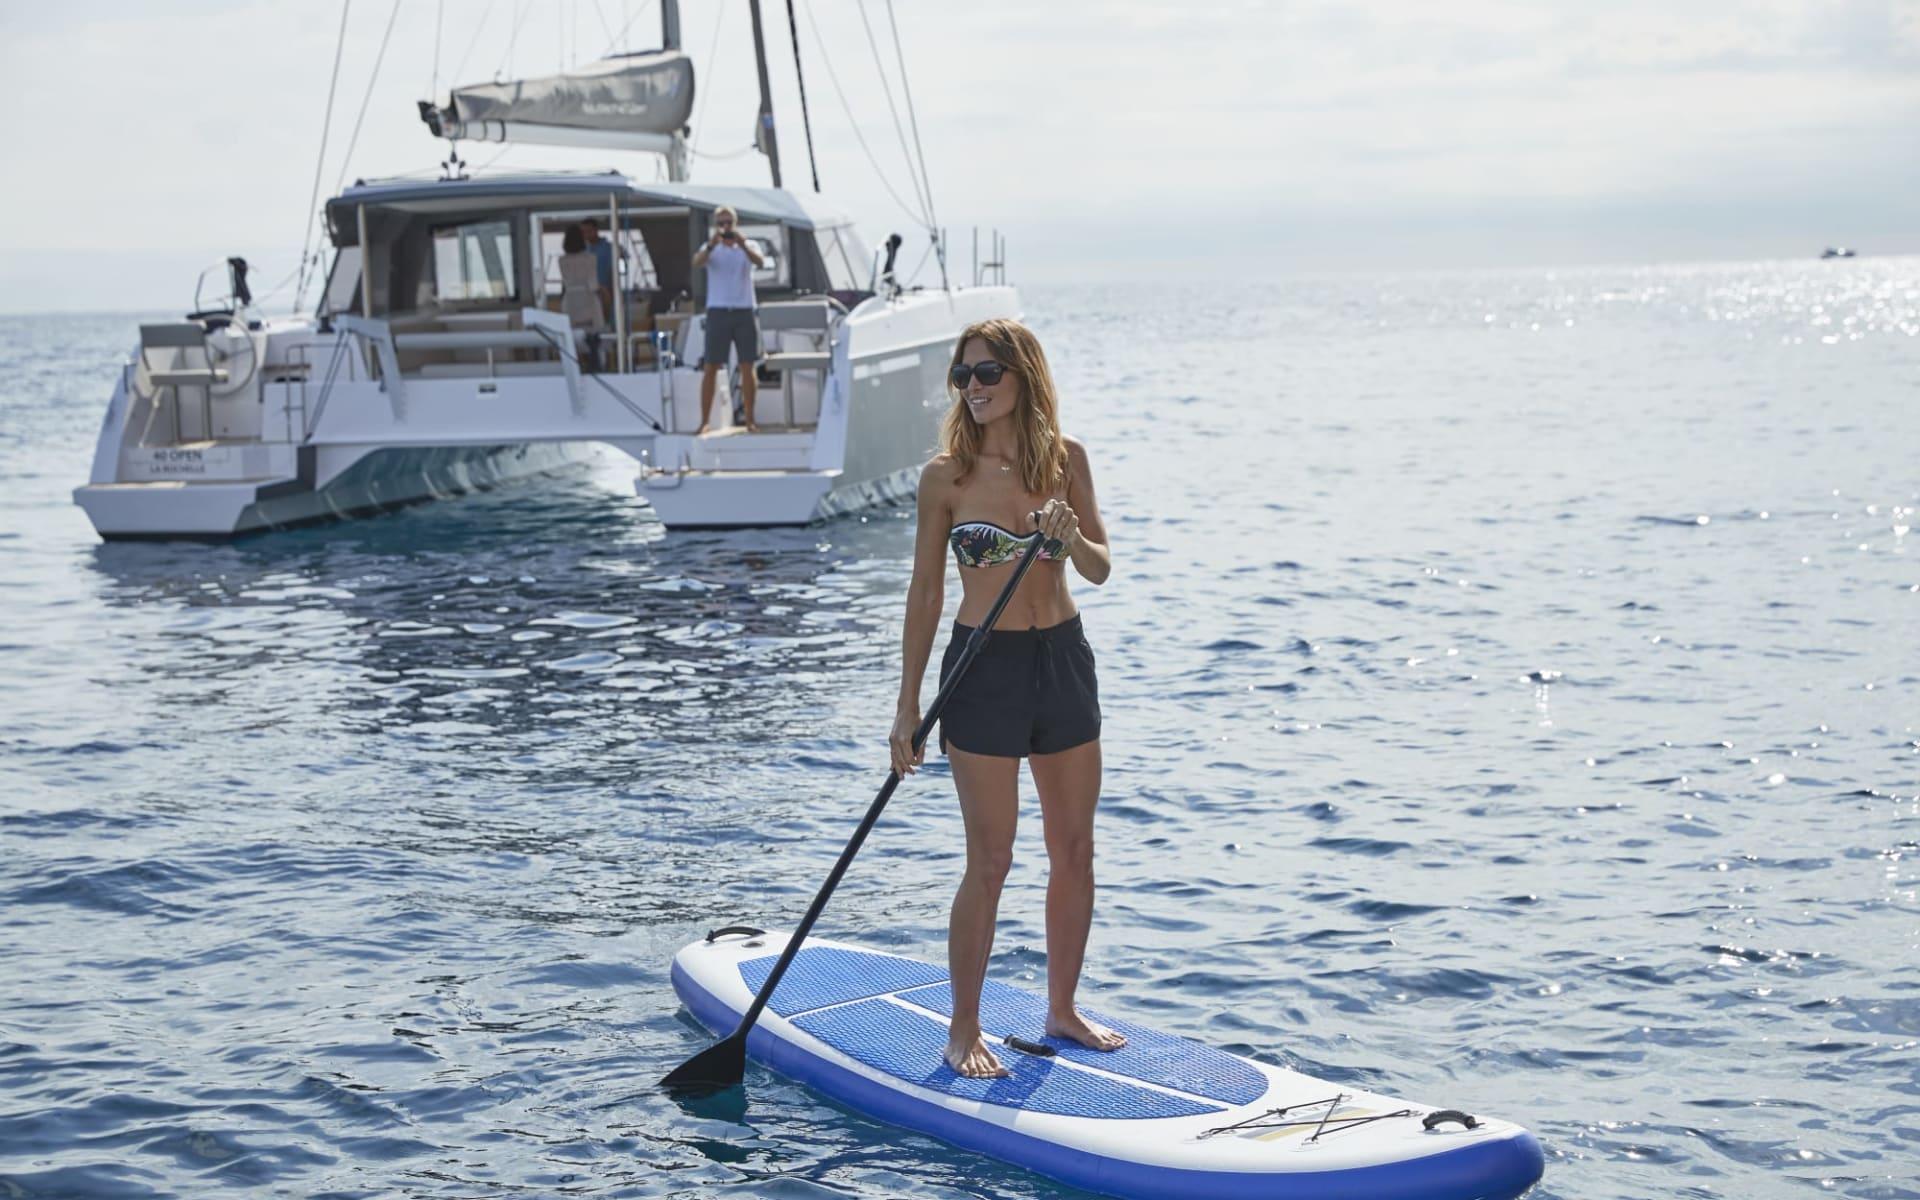 Discovery of Mauritius ab Tamarin: activities: Sea Spirit